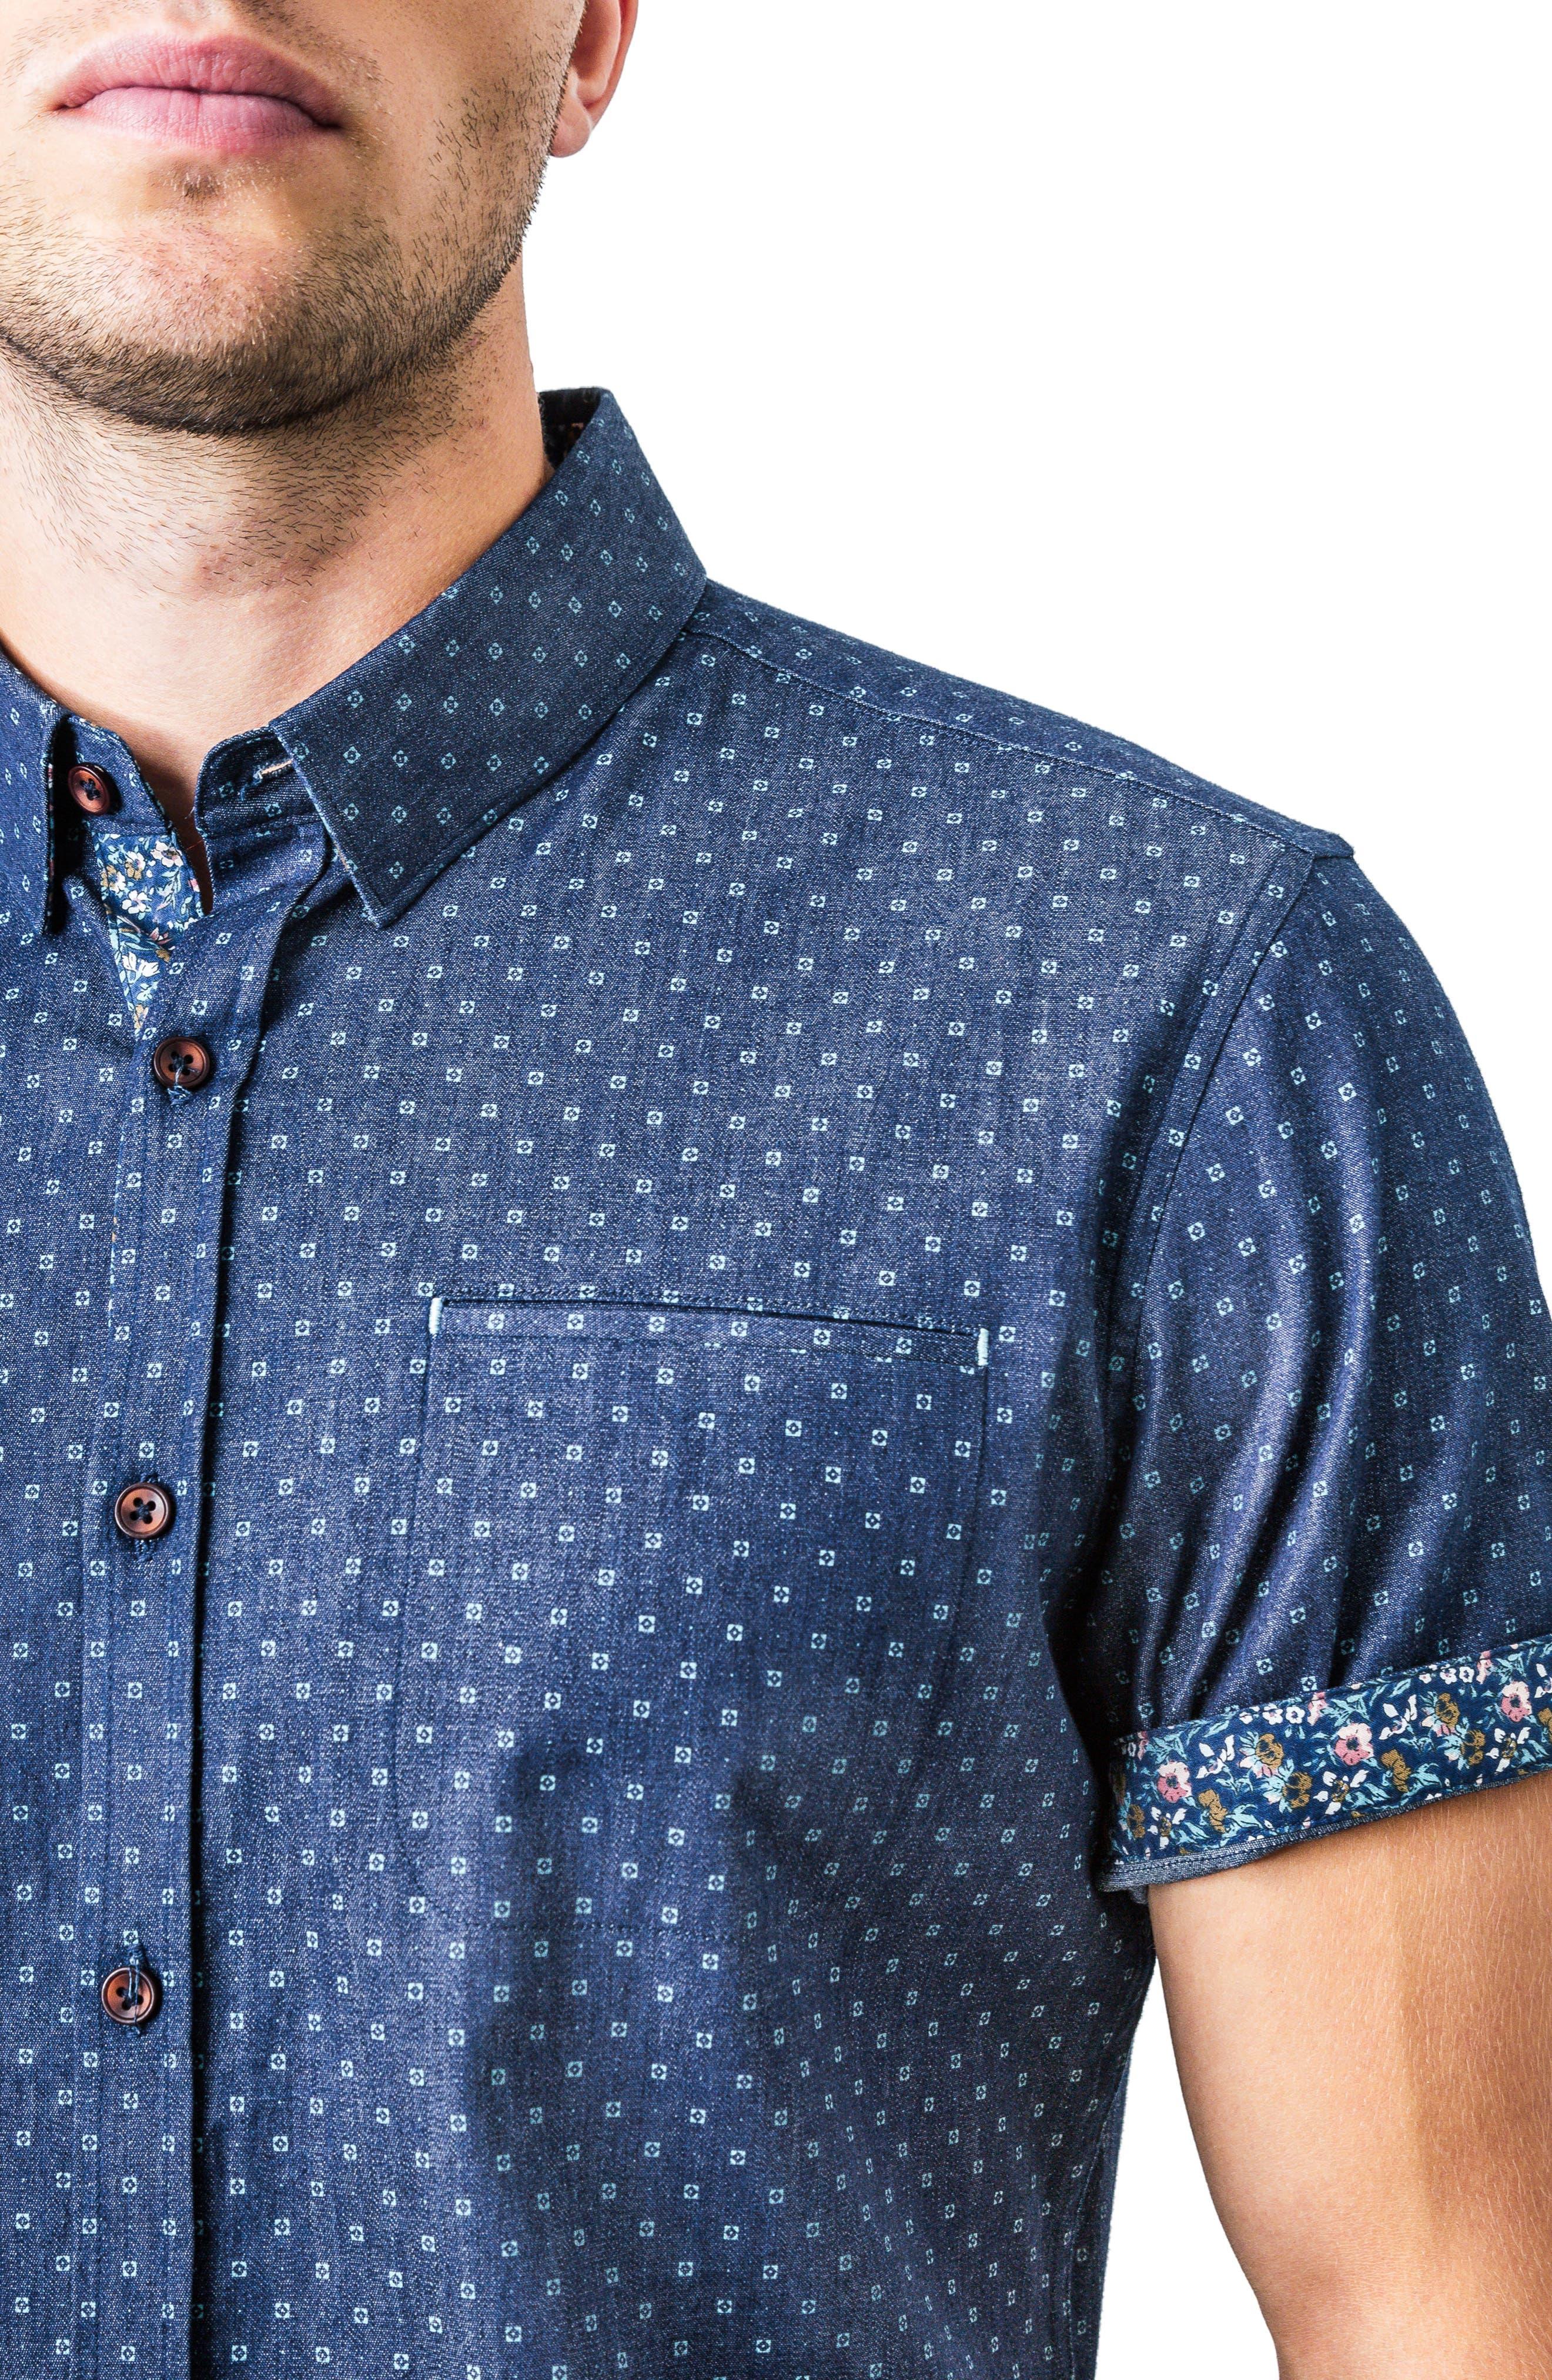 Innervision Woven Shirt,                             Alternate thumbnail 4, color,                             410